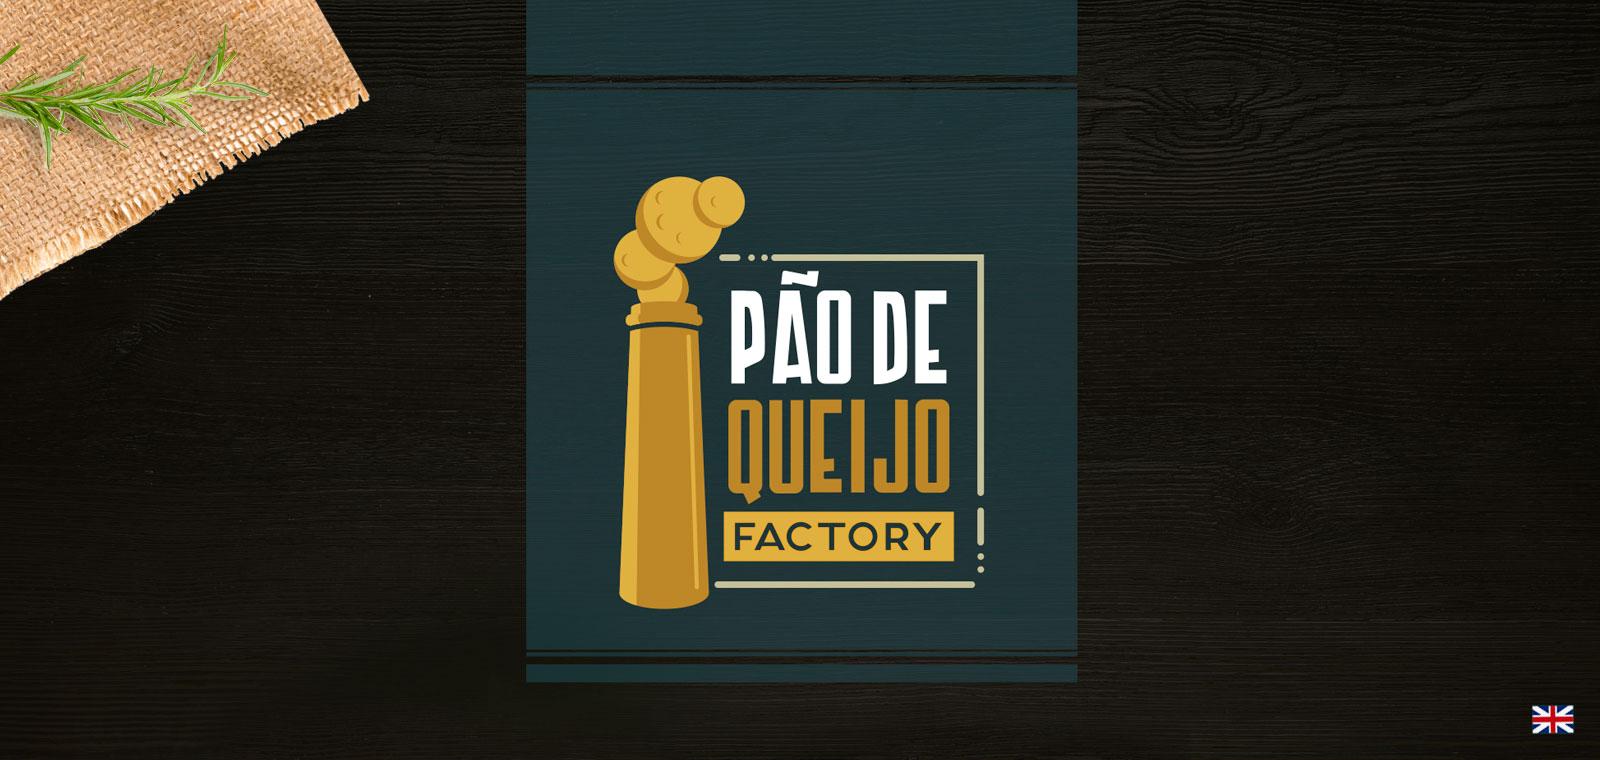 Pão de Queijo Factory